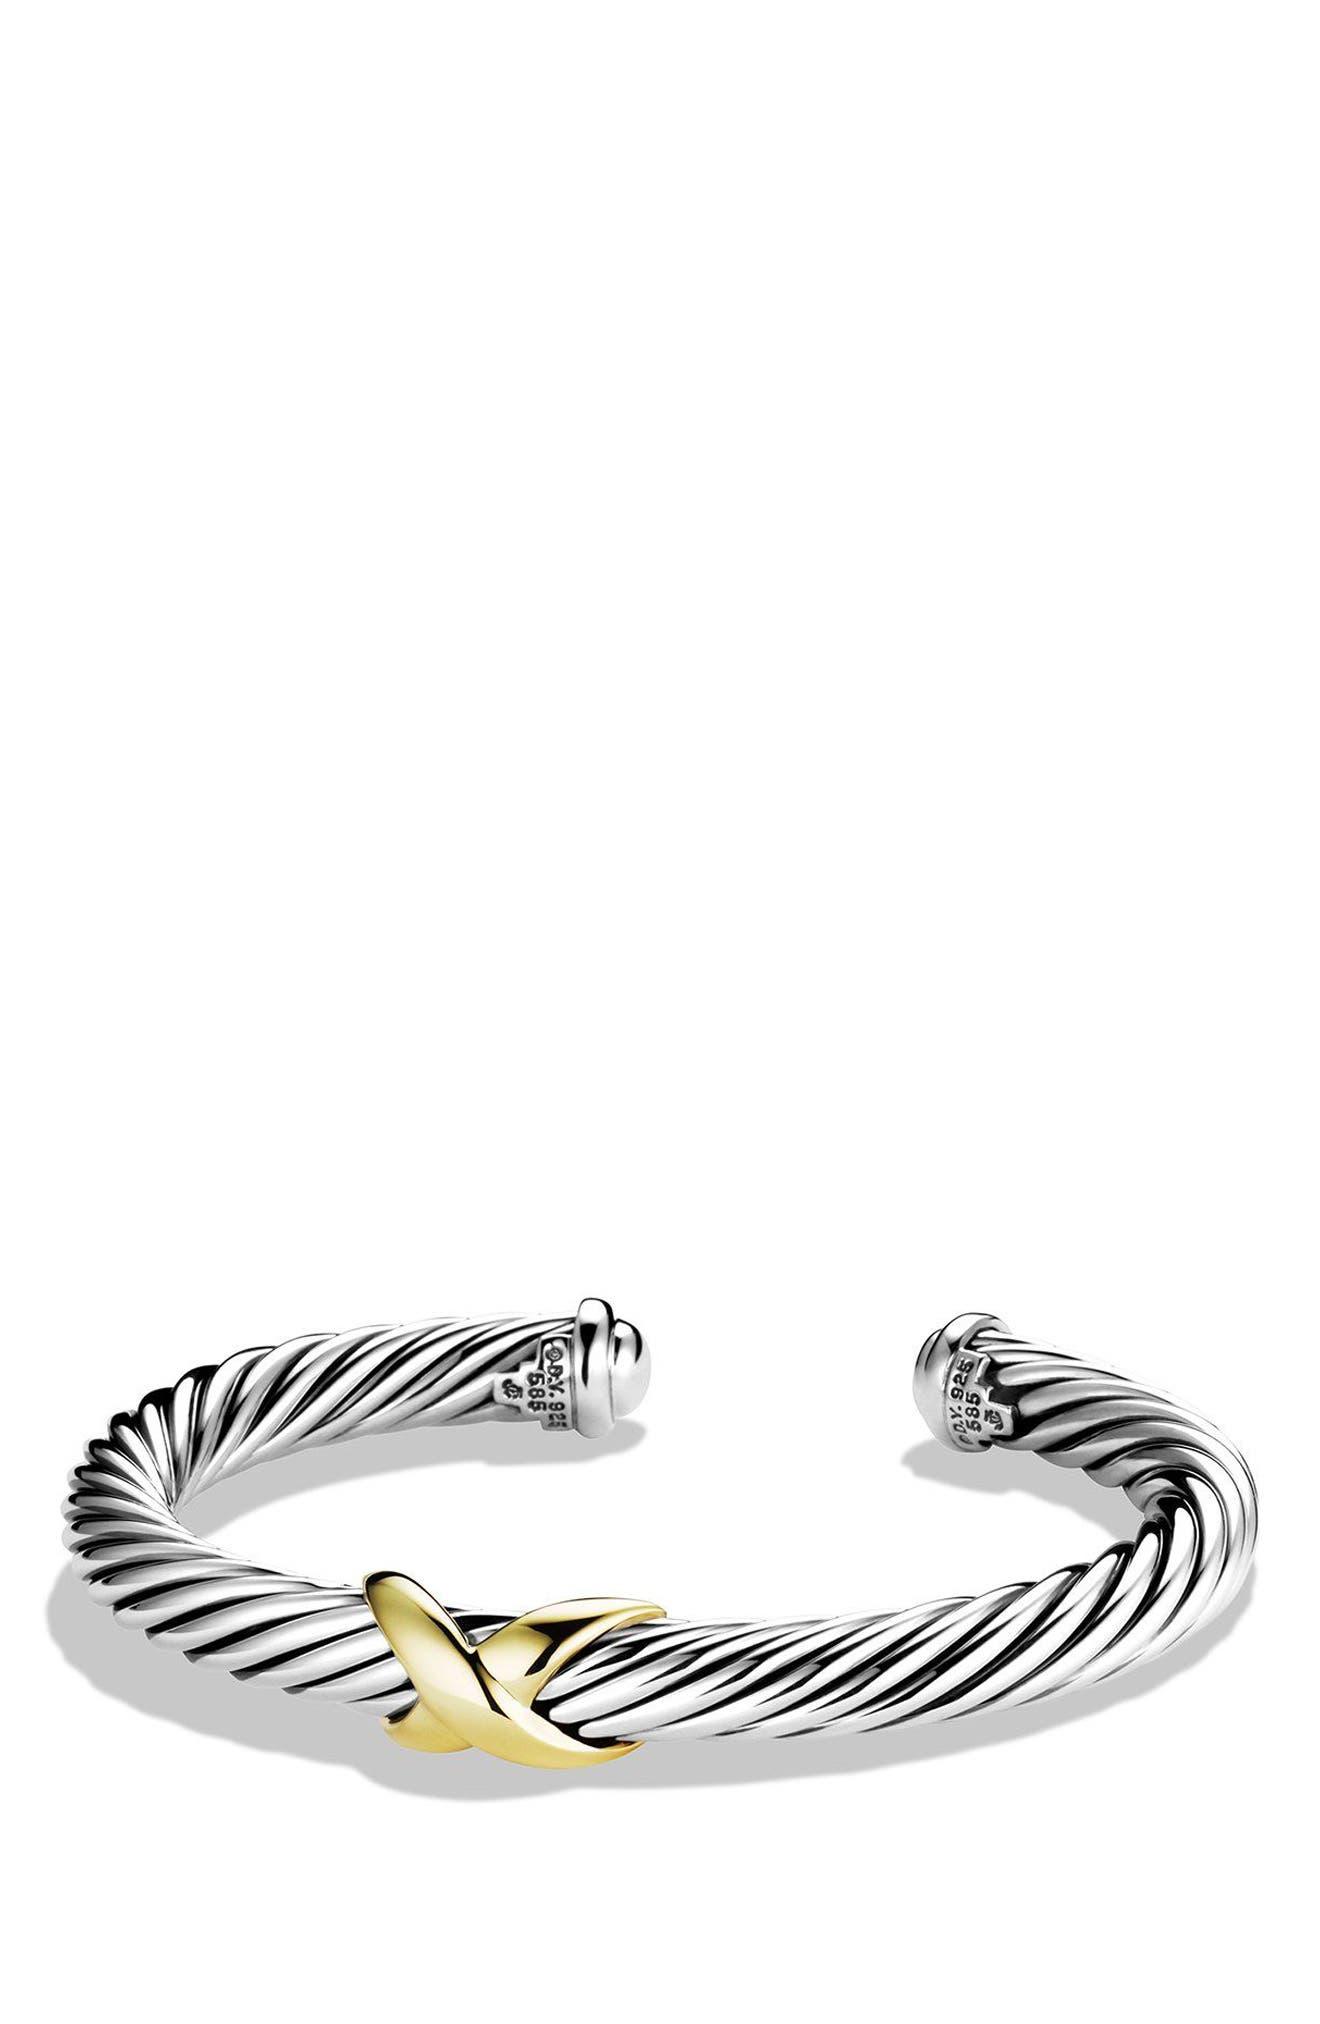 X Bracelet with 14K Gold,                             Main thumbnail 1, color,                             SILVER/ 14K GOLD